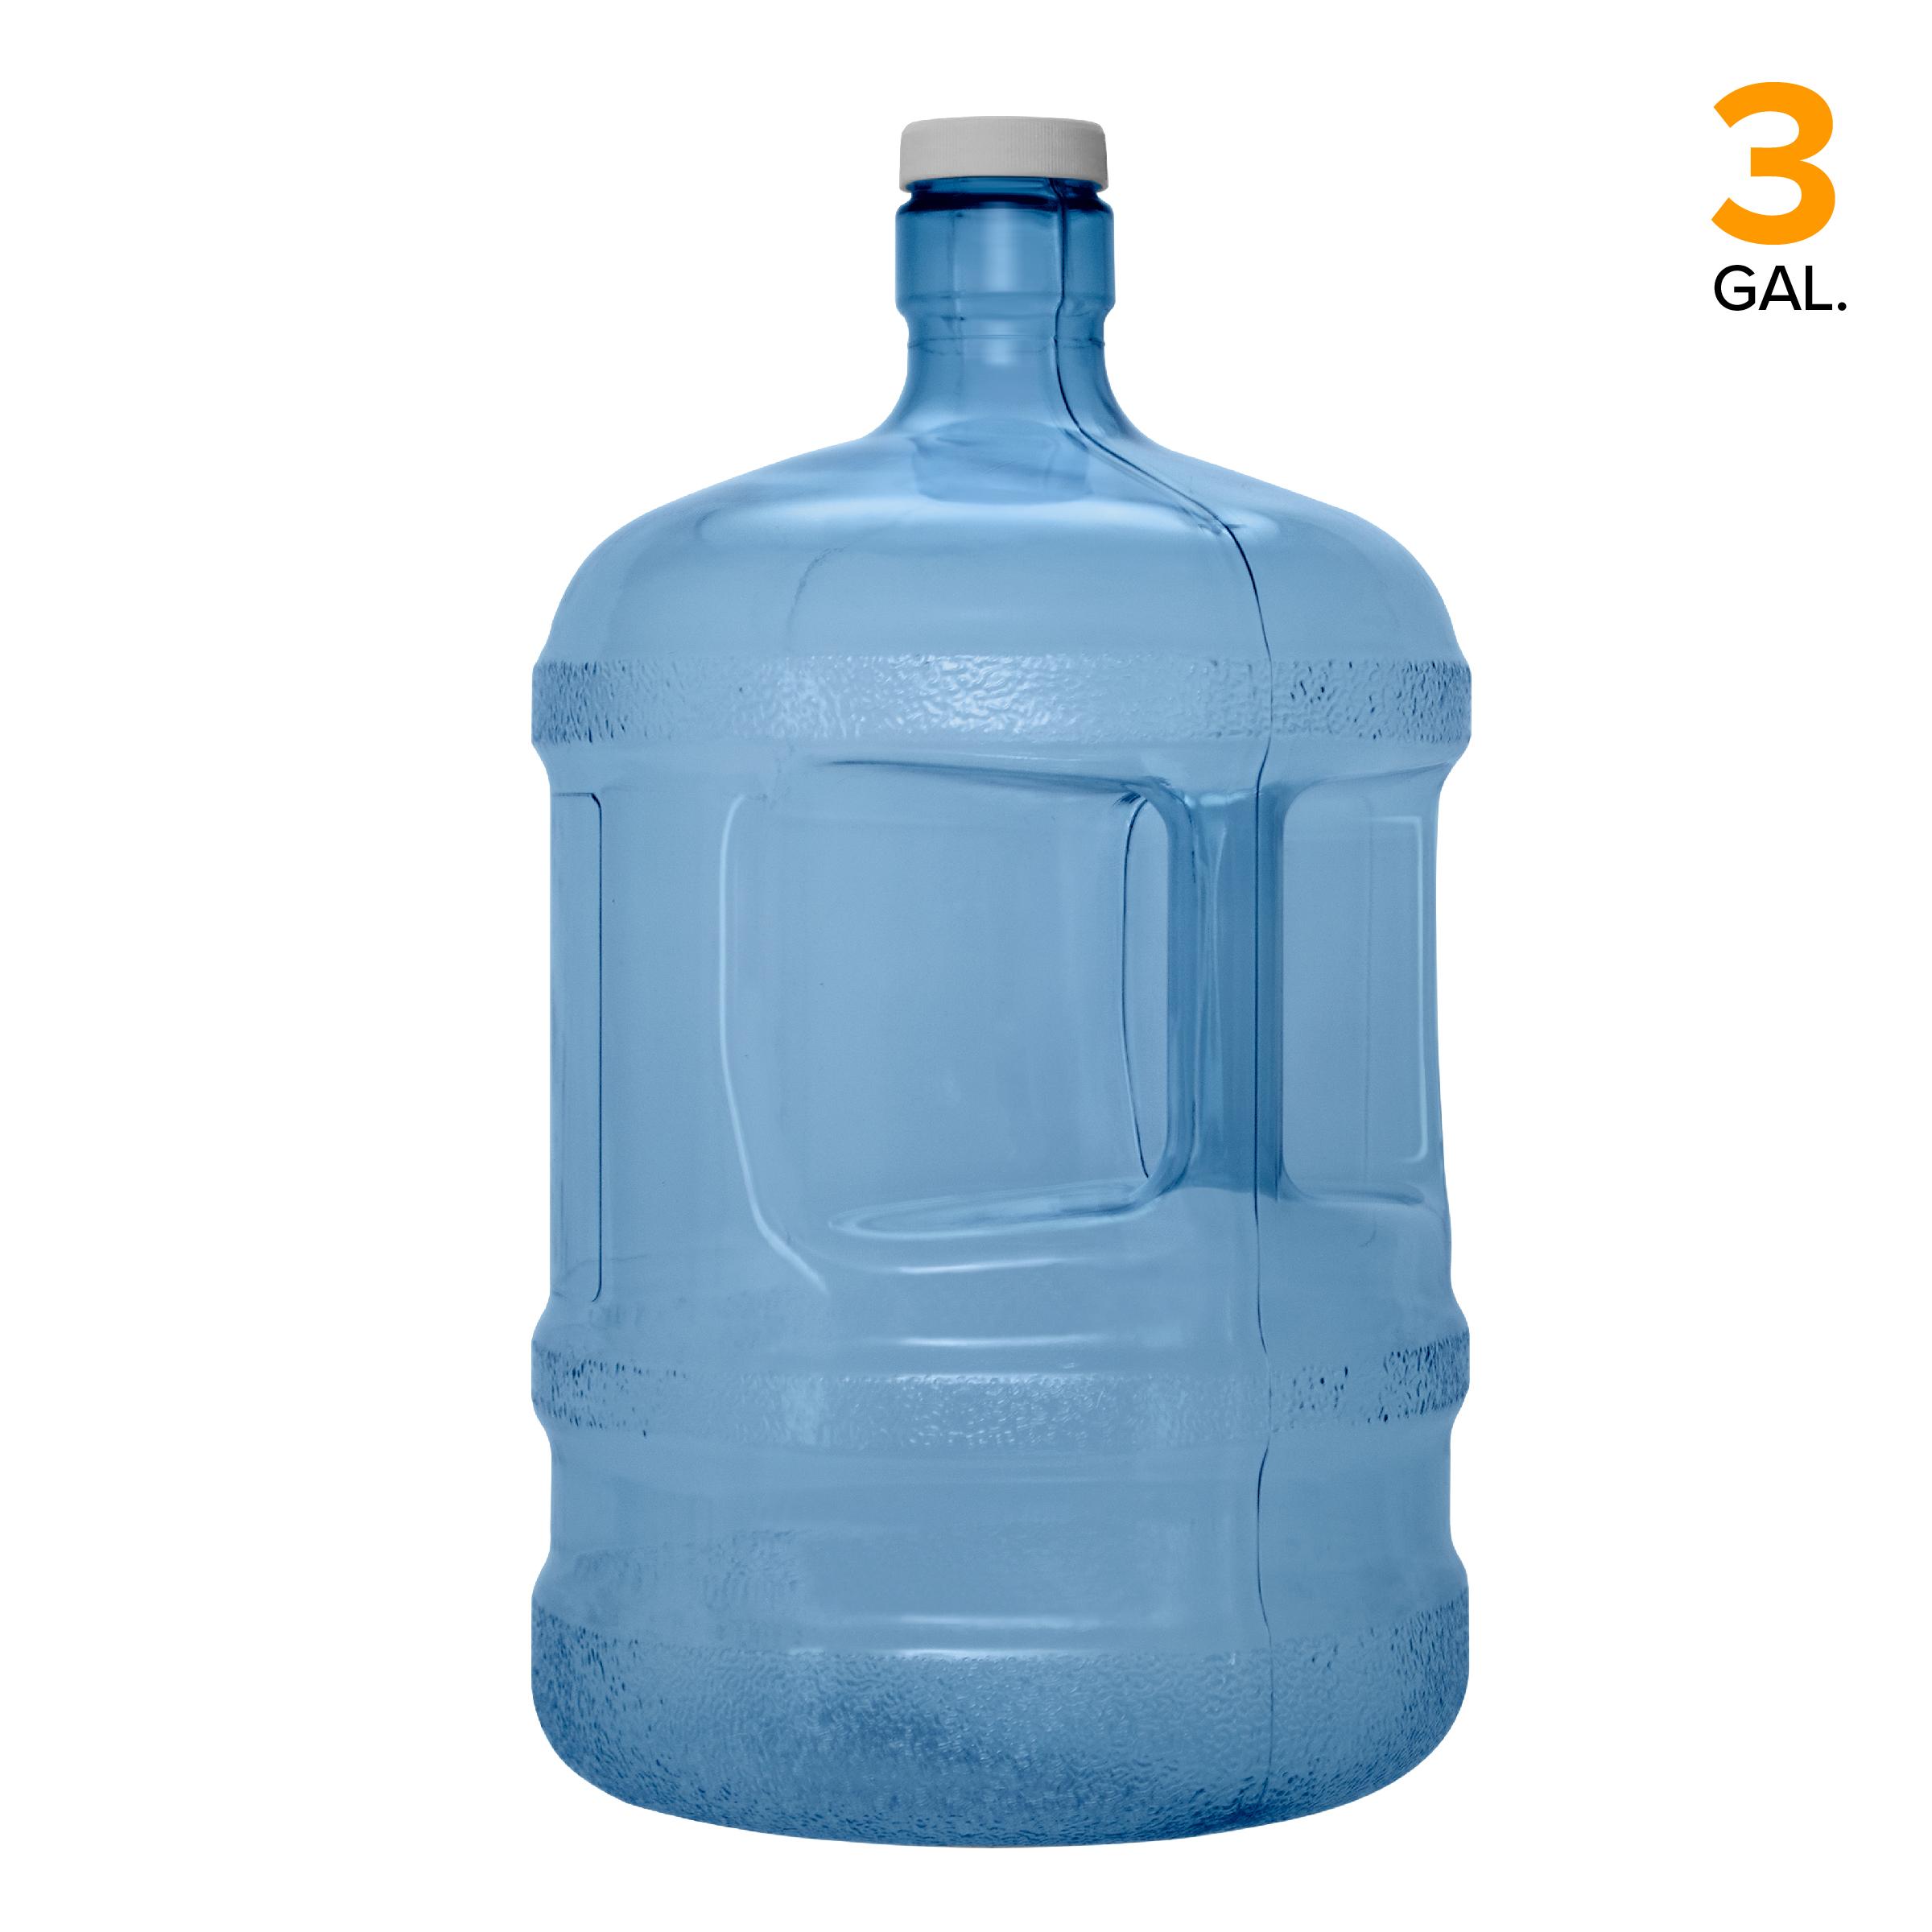 Yellow /& Blue UNIONFACTORY 2 Pack Advanced Ergonomic 5 Gallon Water Bottle Handle,Drinking Water Bottle Handle,Fit 5 Gallon Water Bottle Caps,5 Gal Bottle Carrier,Water Bottle Lift with Handle